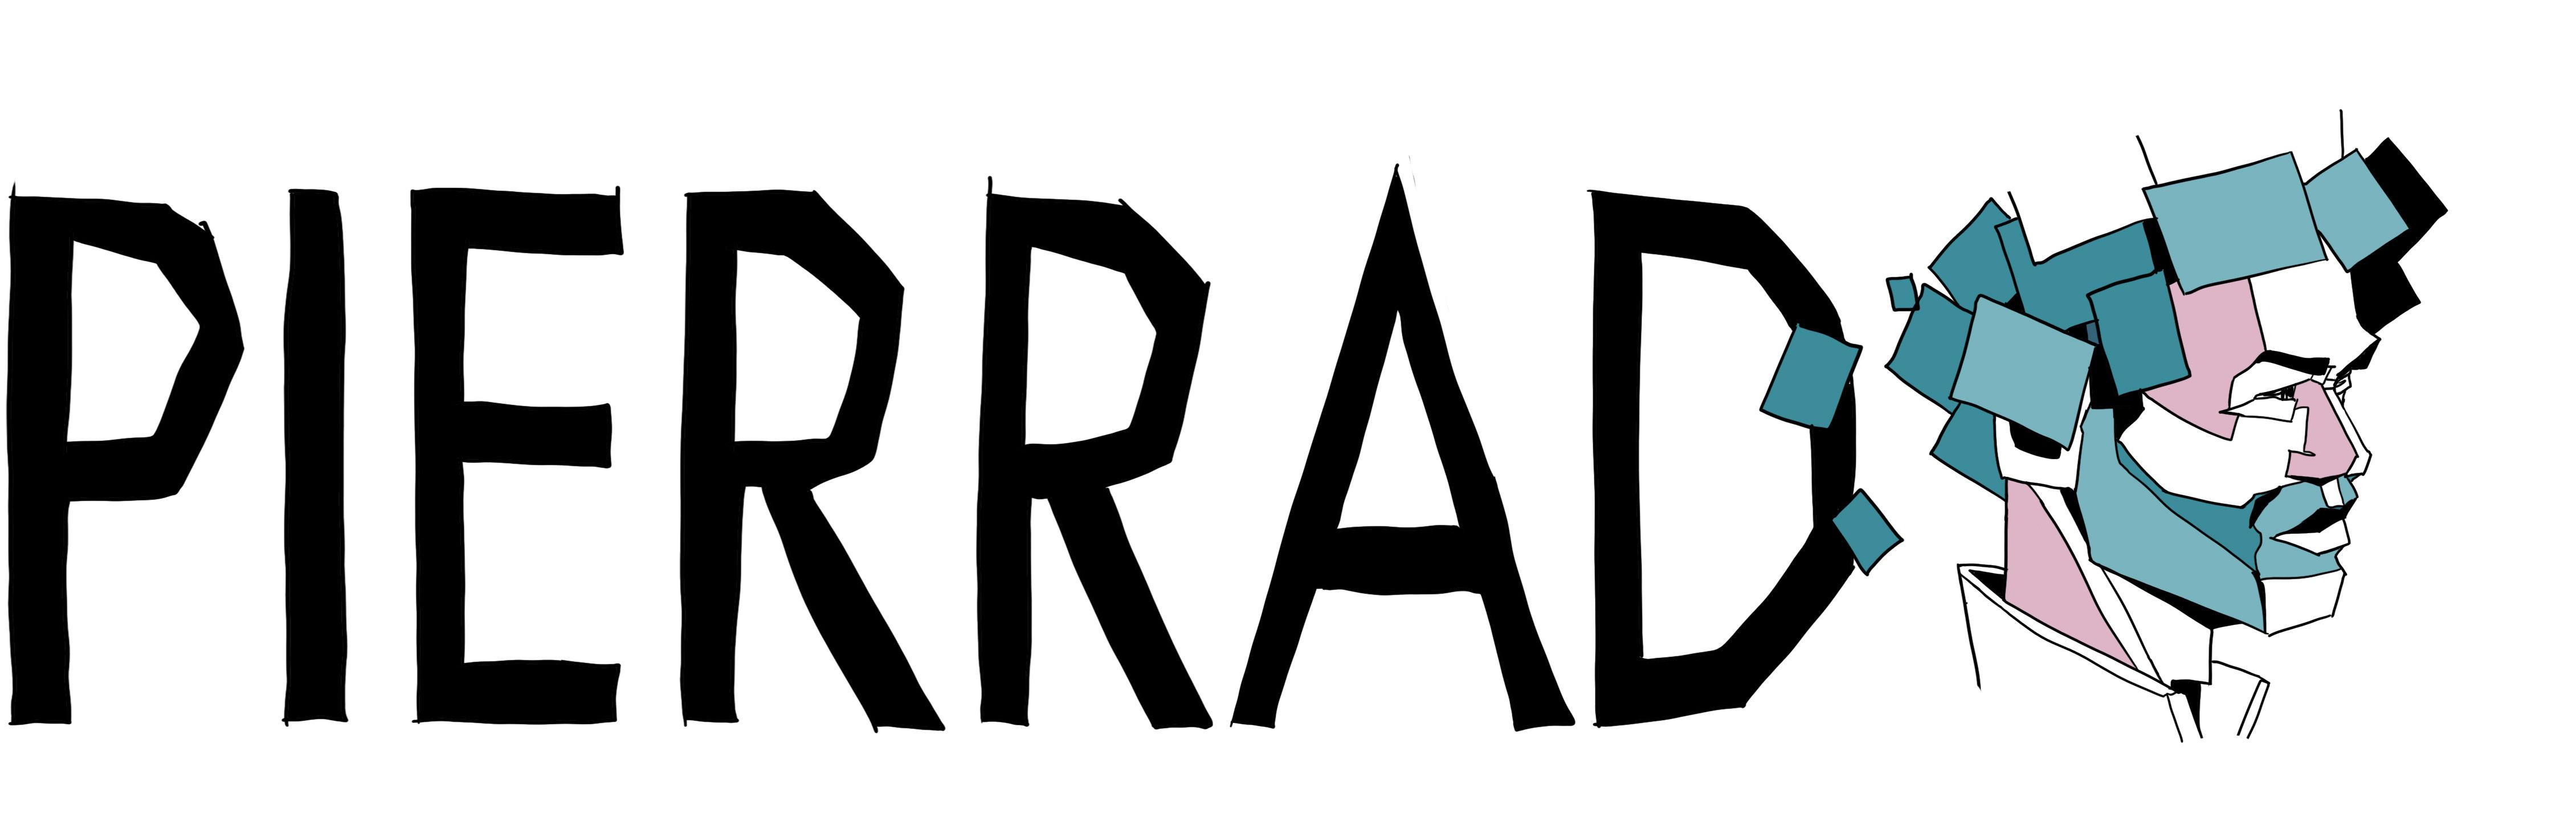 Pierrad